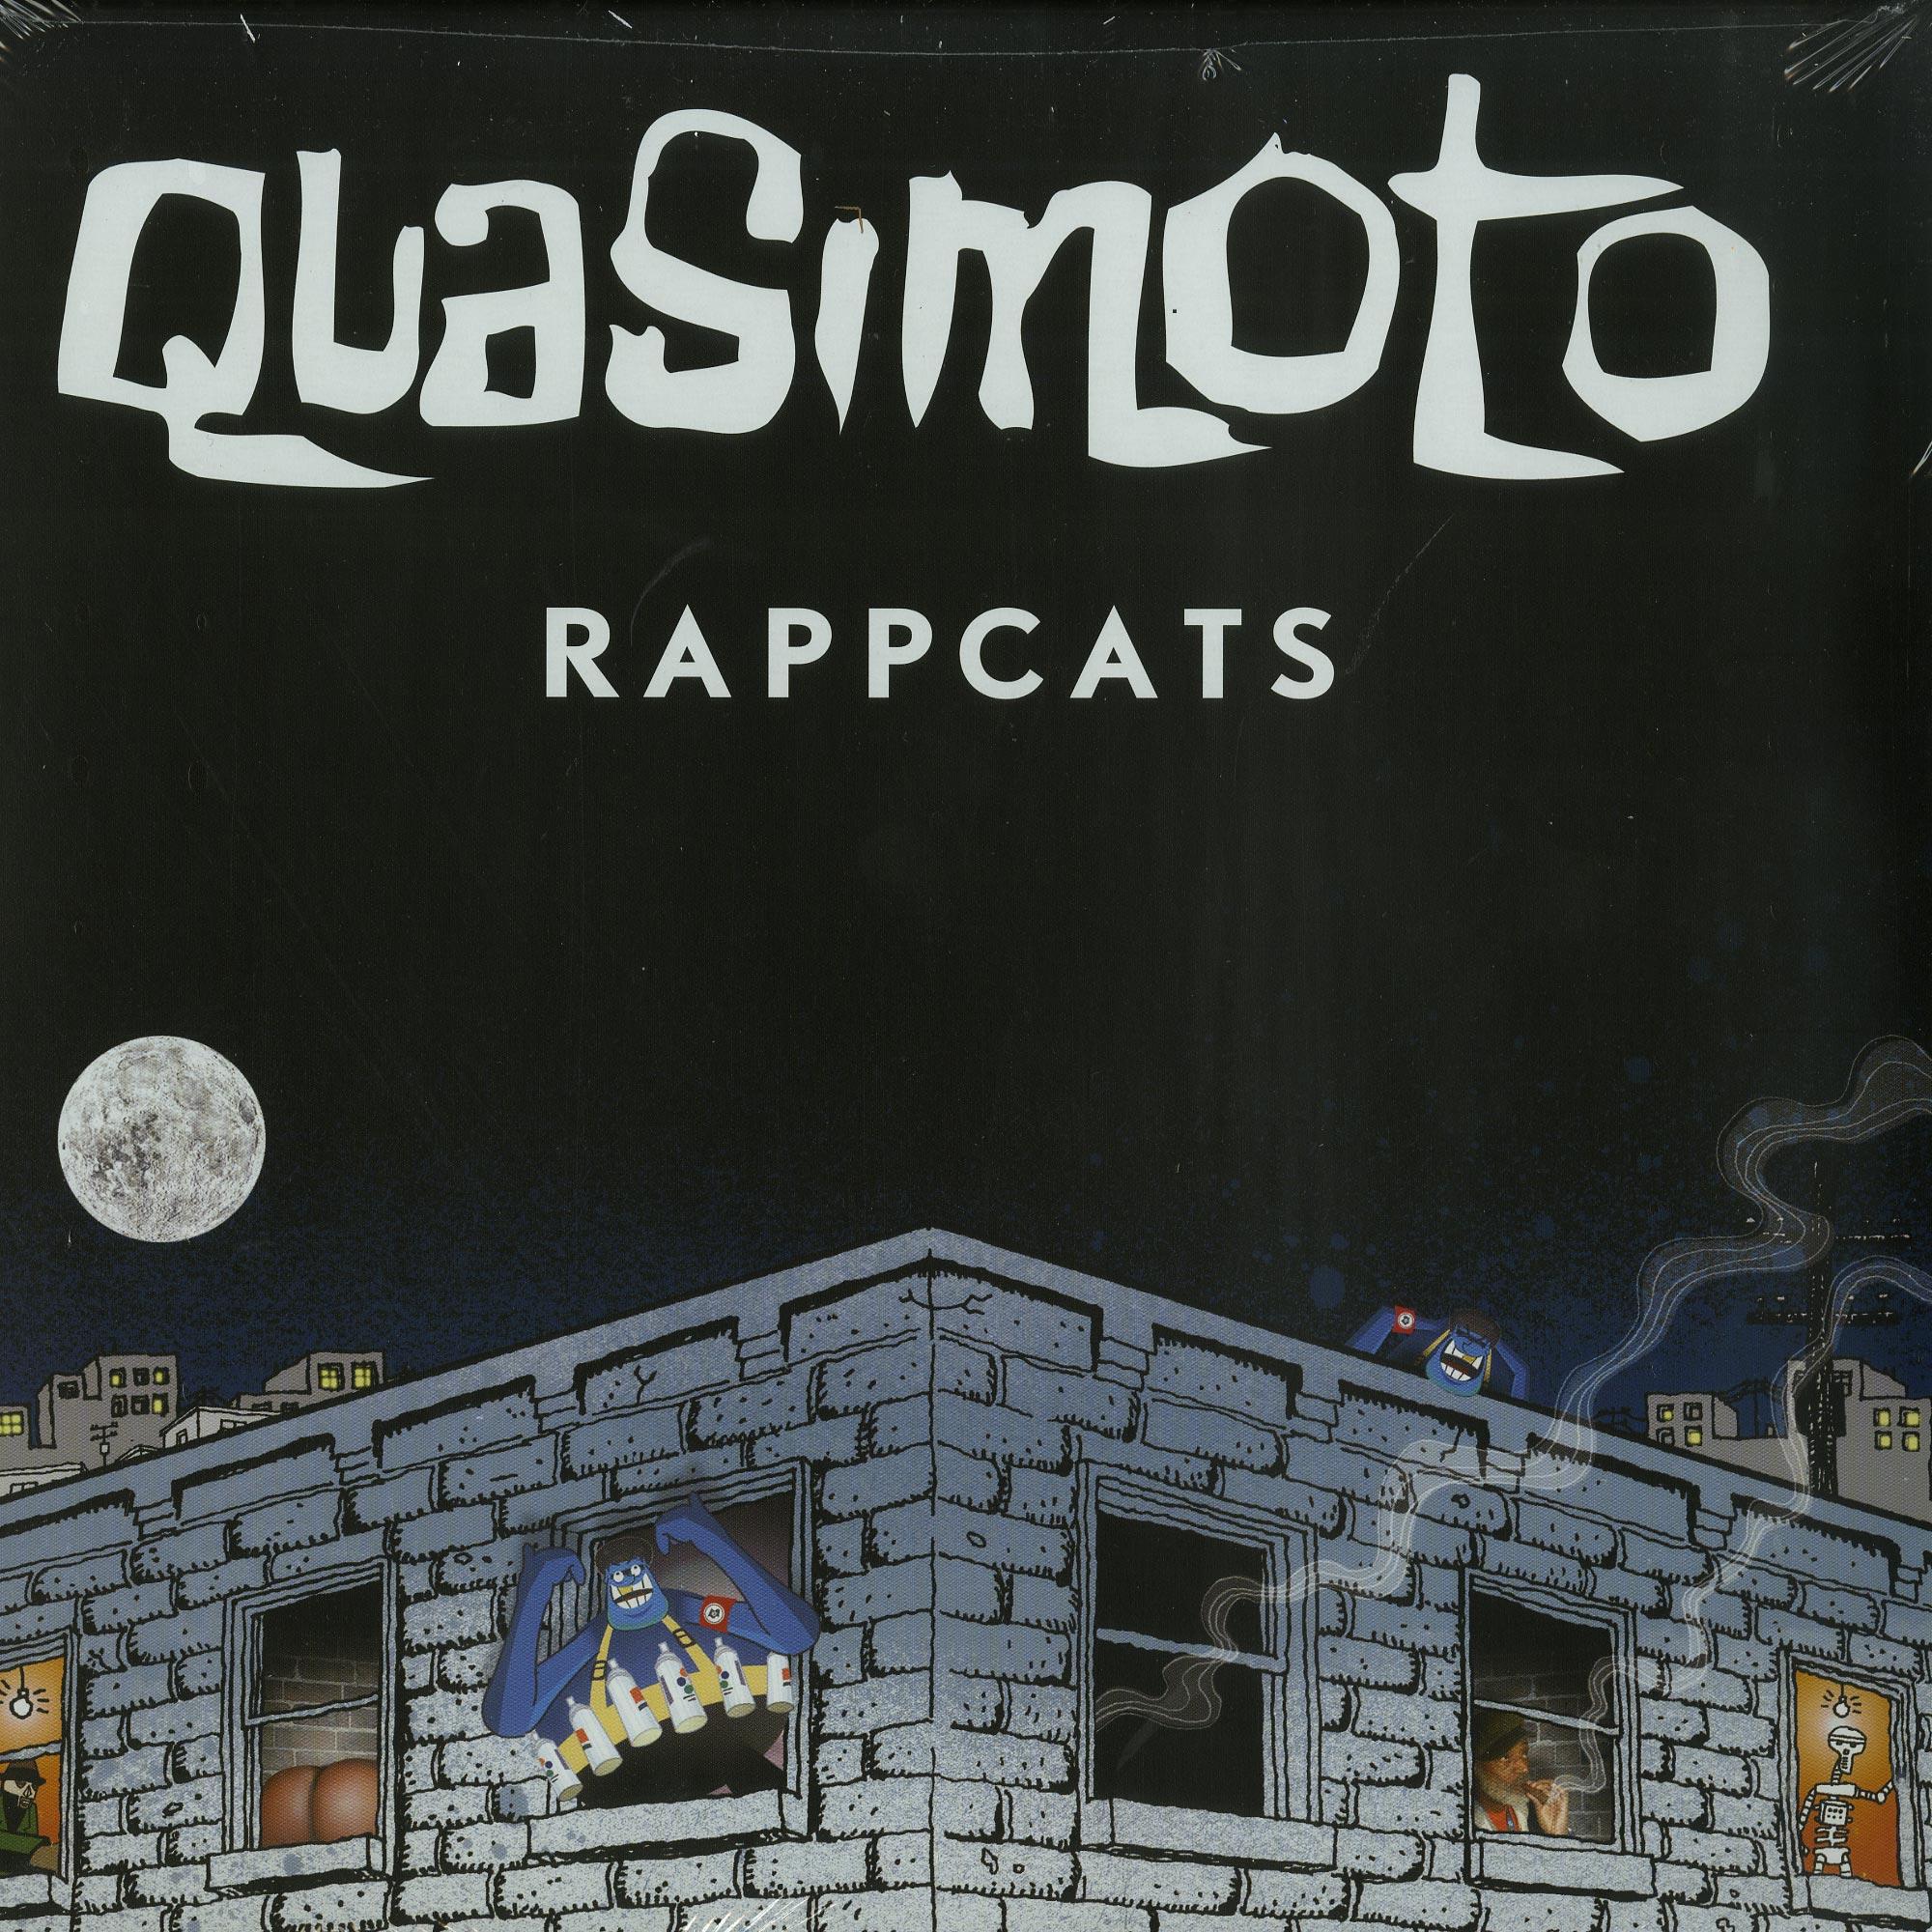 Quasimoto - BUS RIDE / RAPPCATS